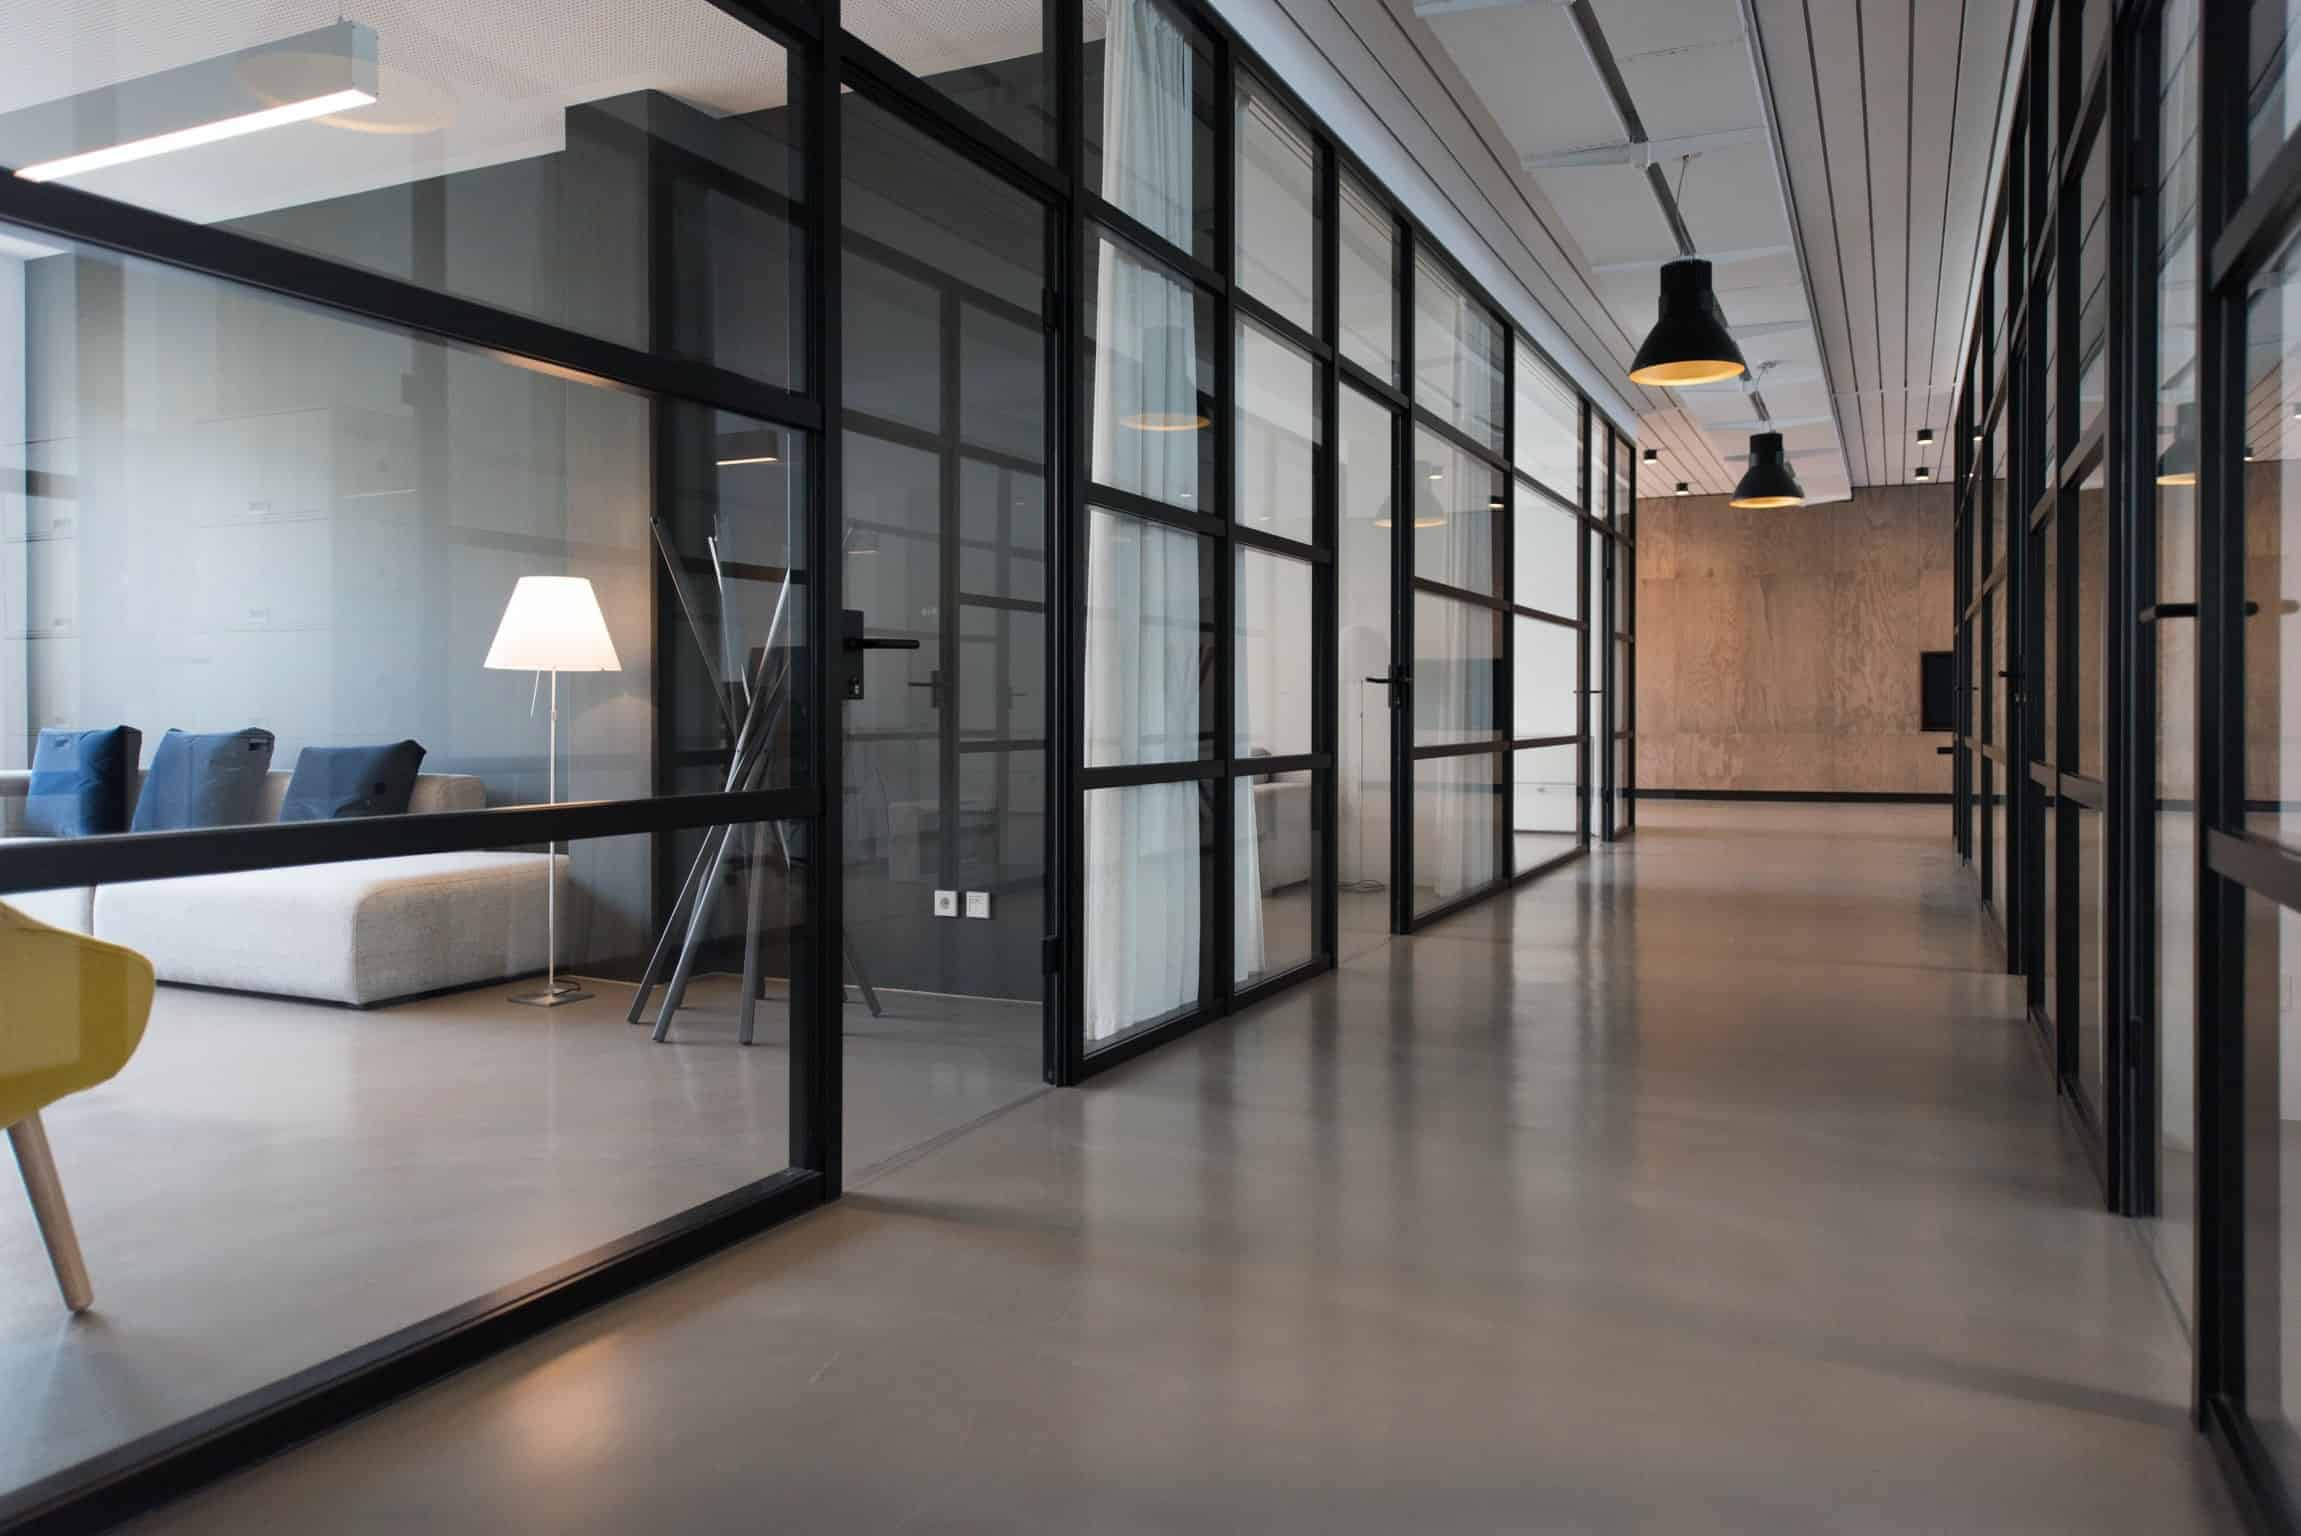 Diese 3 Schweizer Immobilieninvestoren sind an Büroimmobilien interessiert